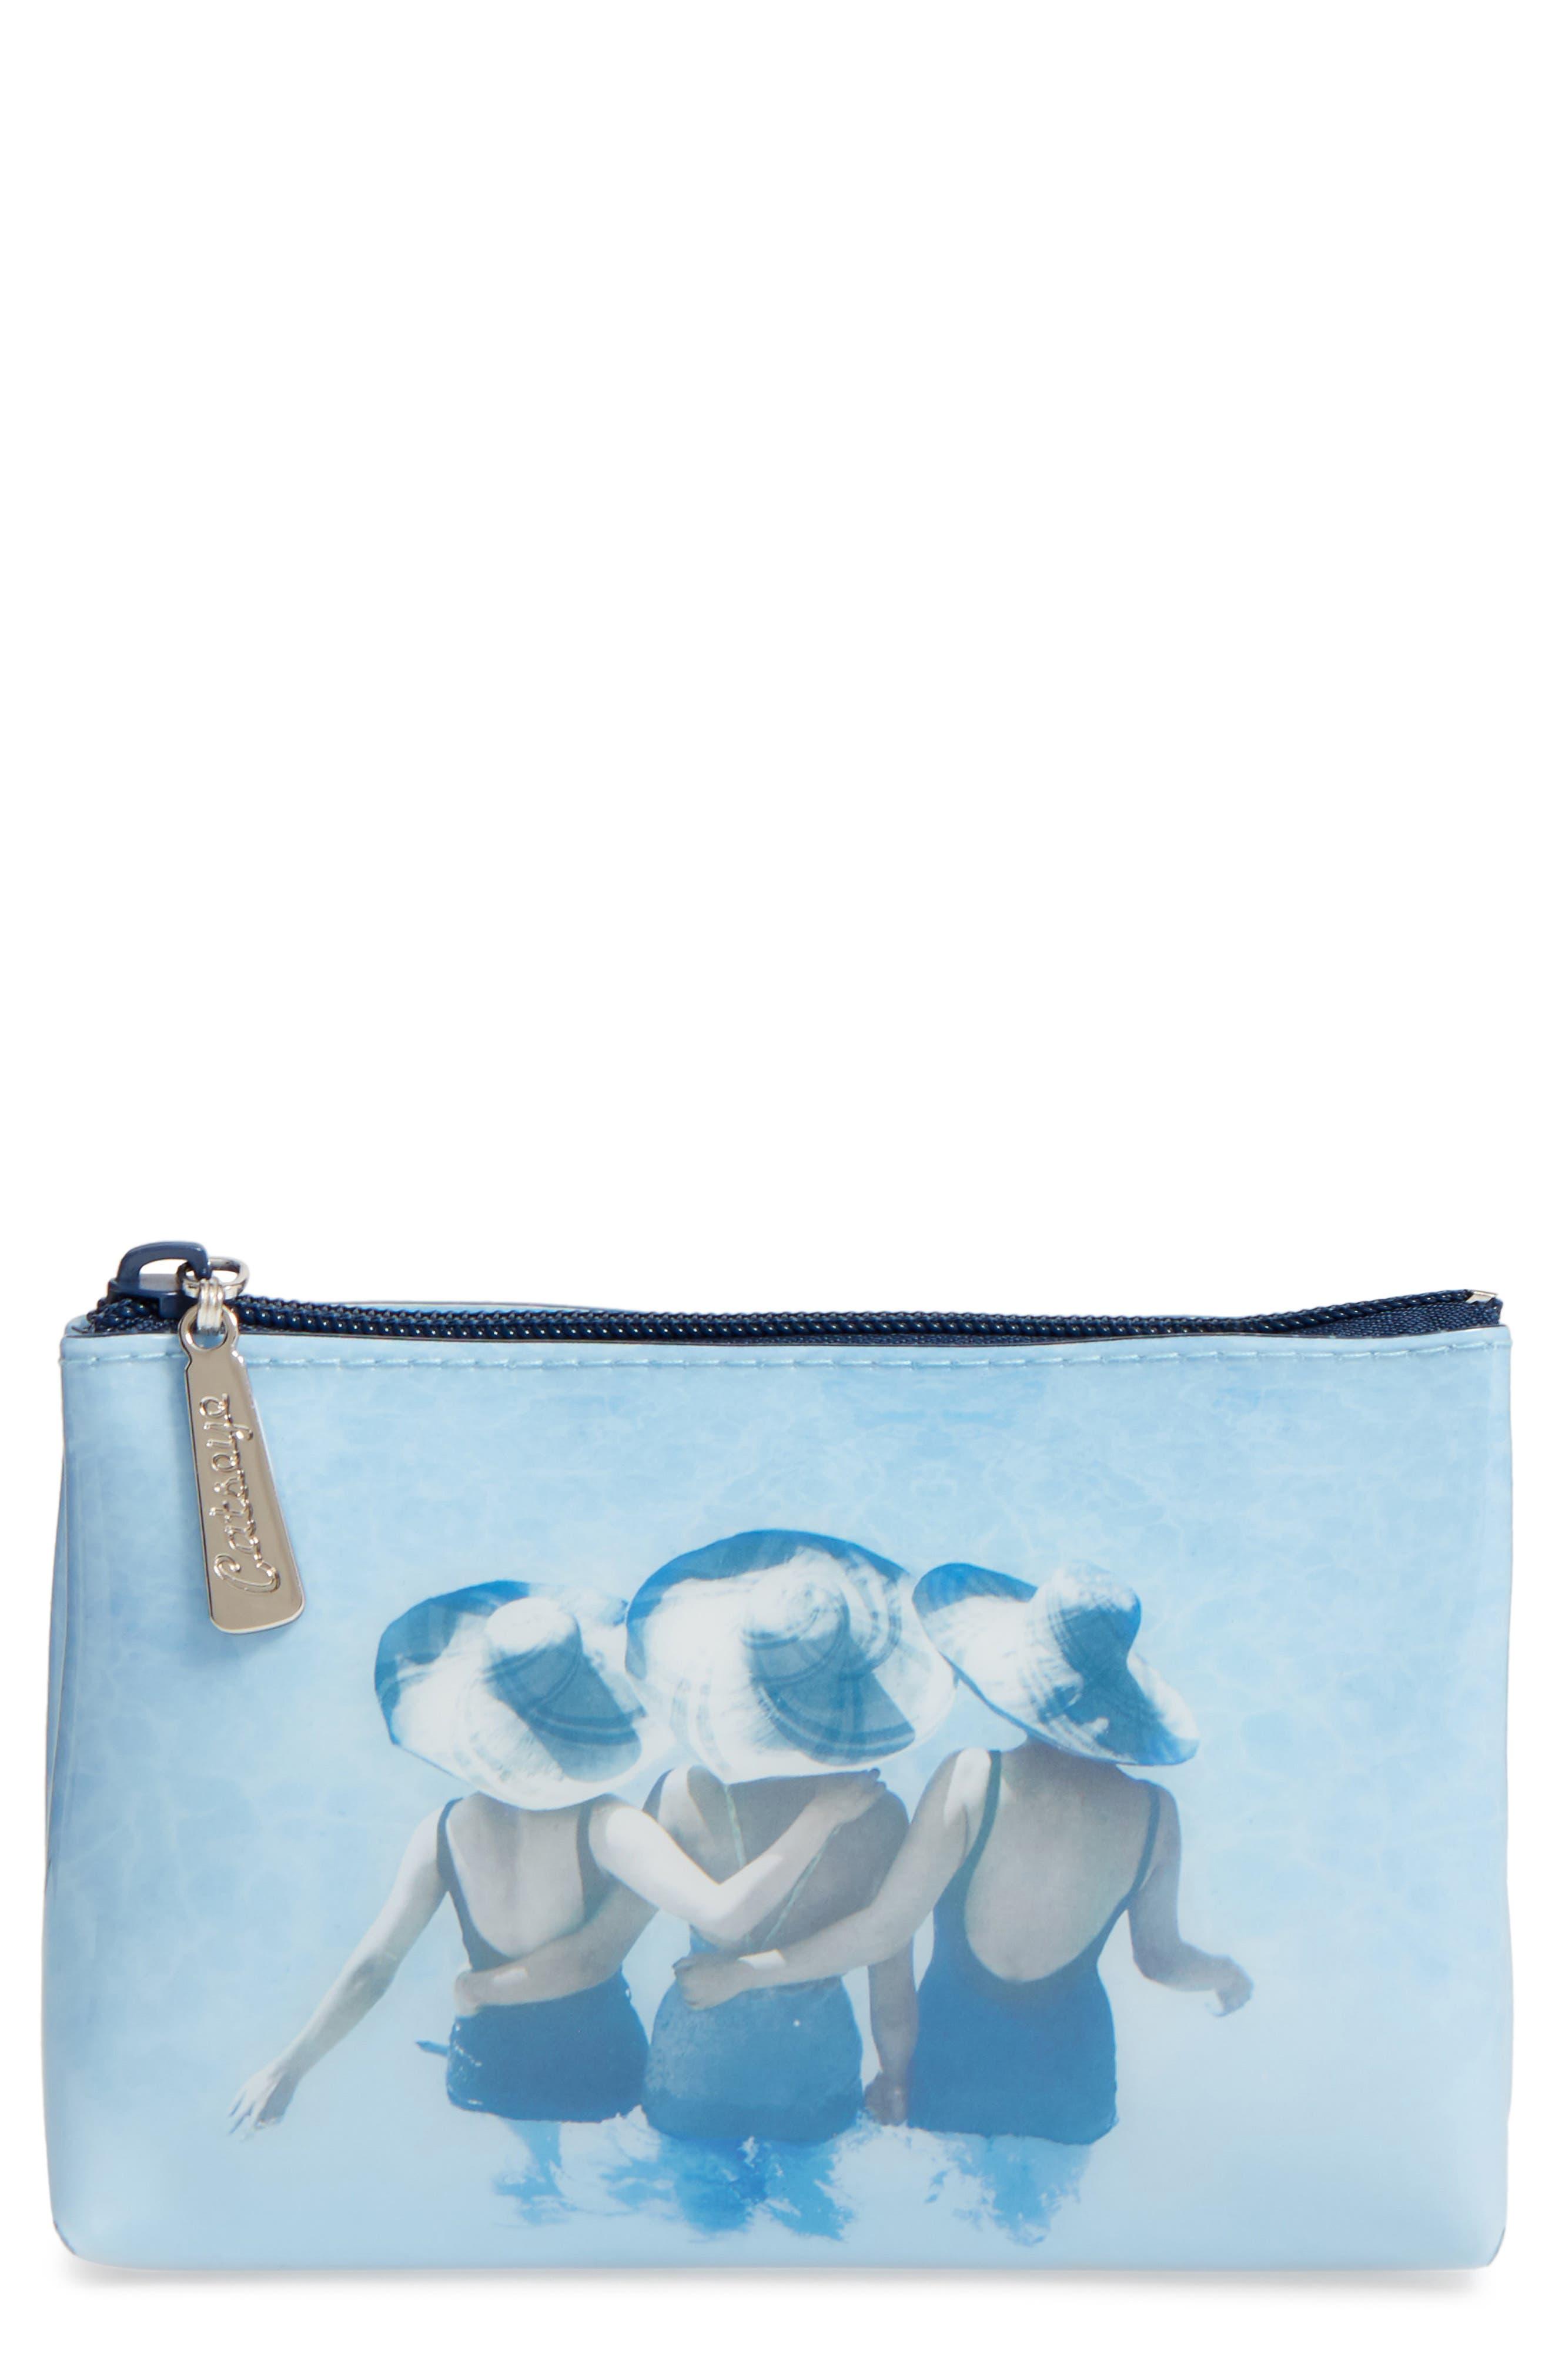 Alternate Image 1 Selected - Catseye London Beach Hats Zip Pouch